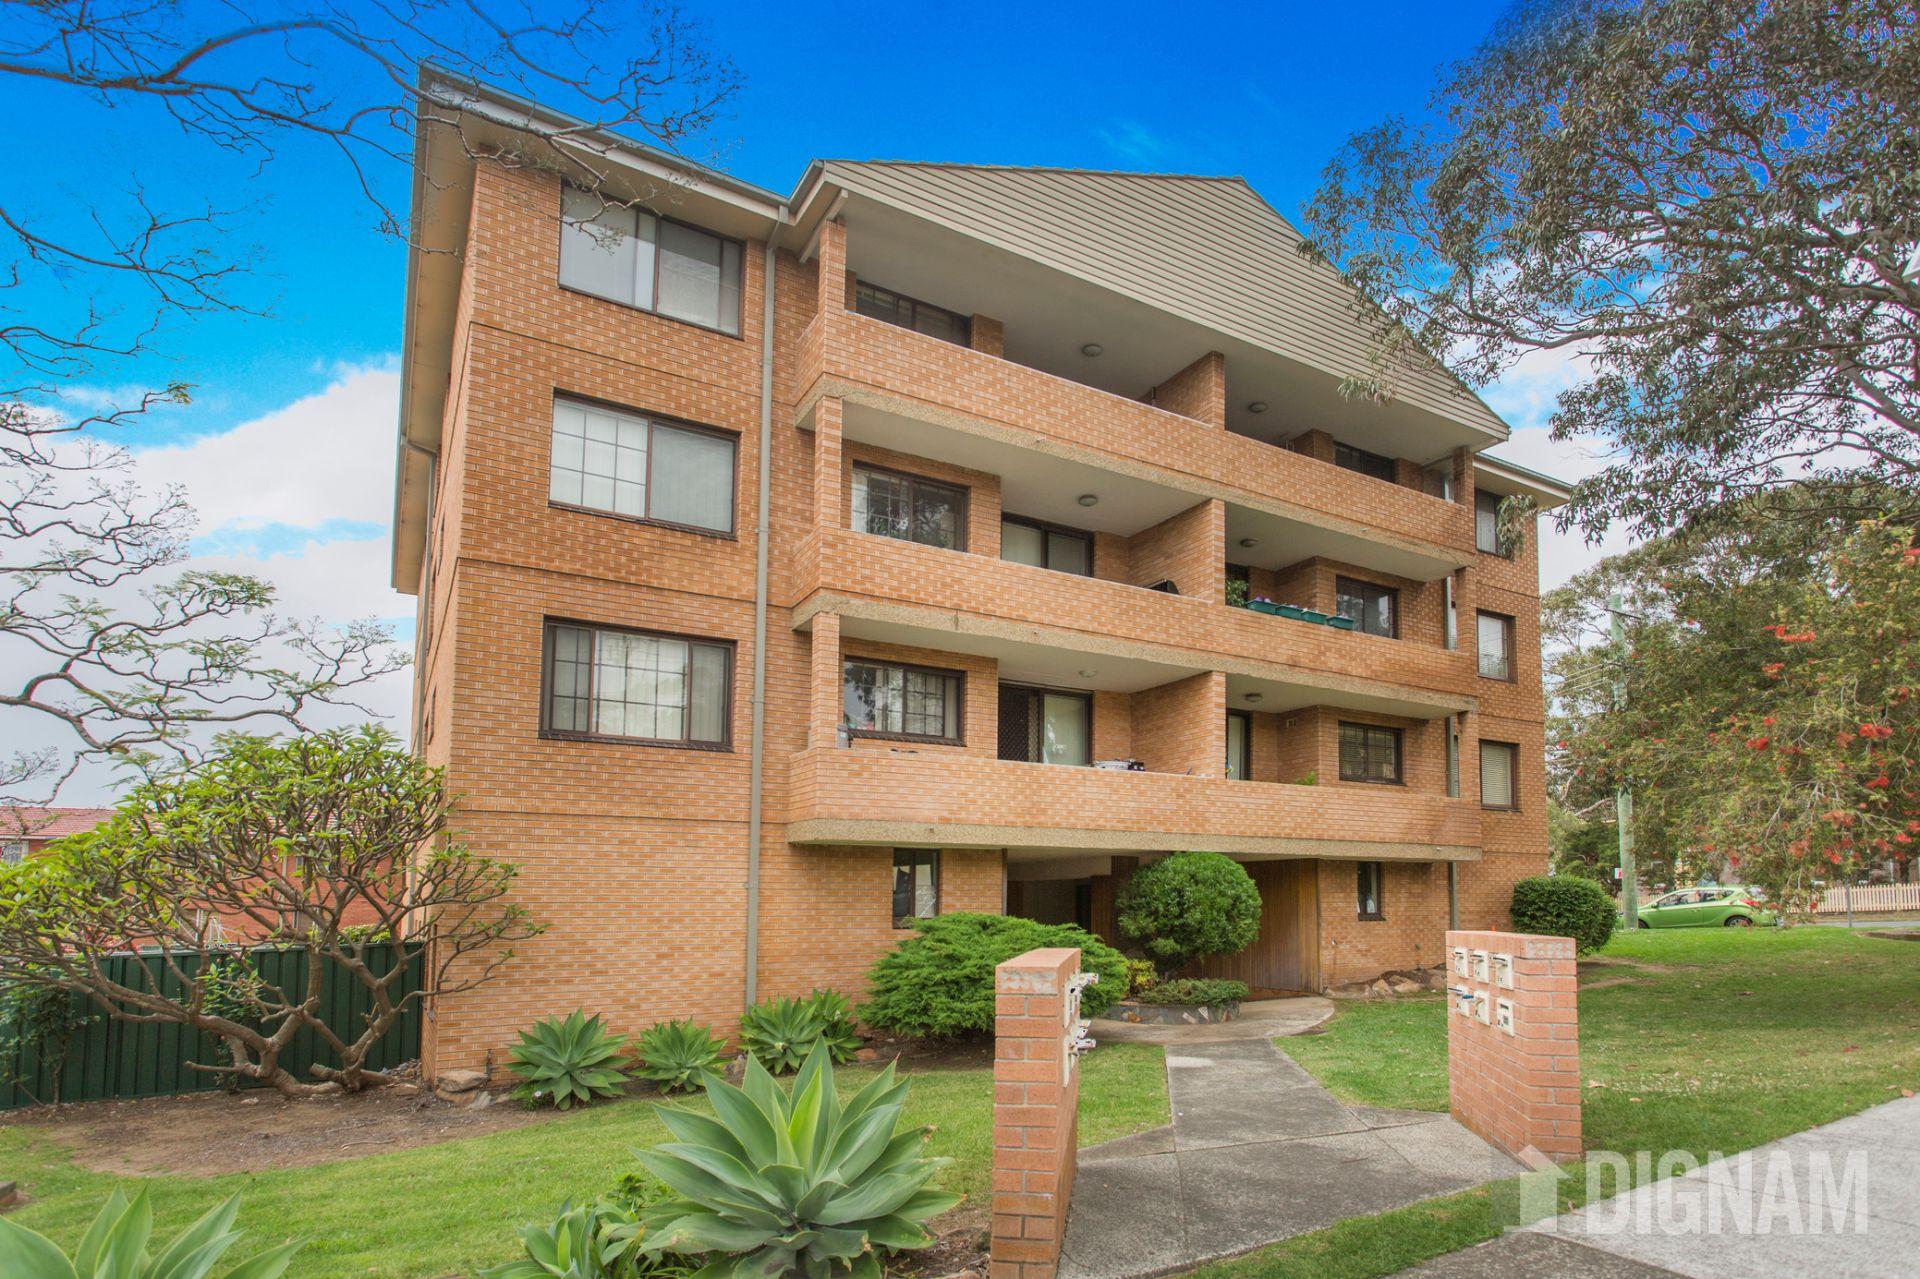 8/70-74 Smith Street, Wollongong NSW